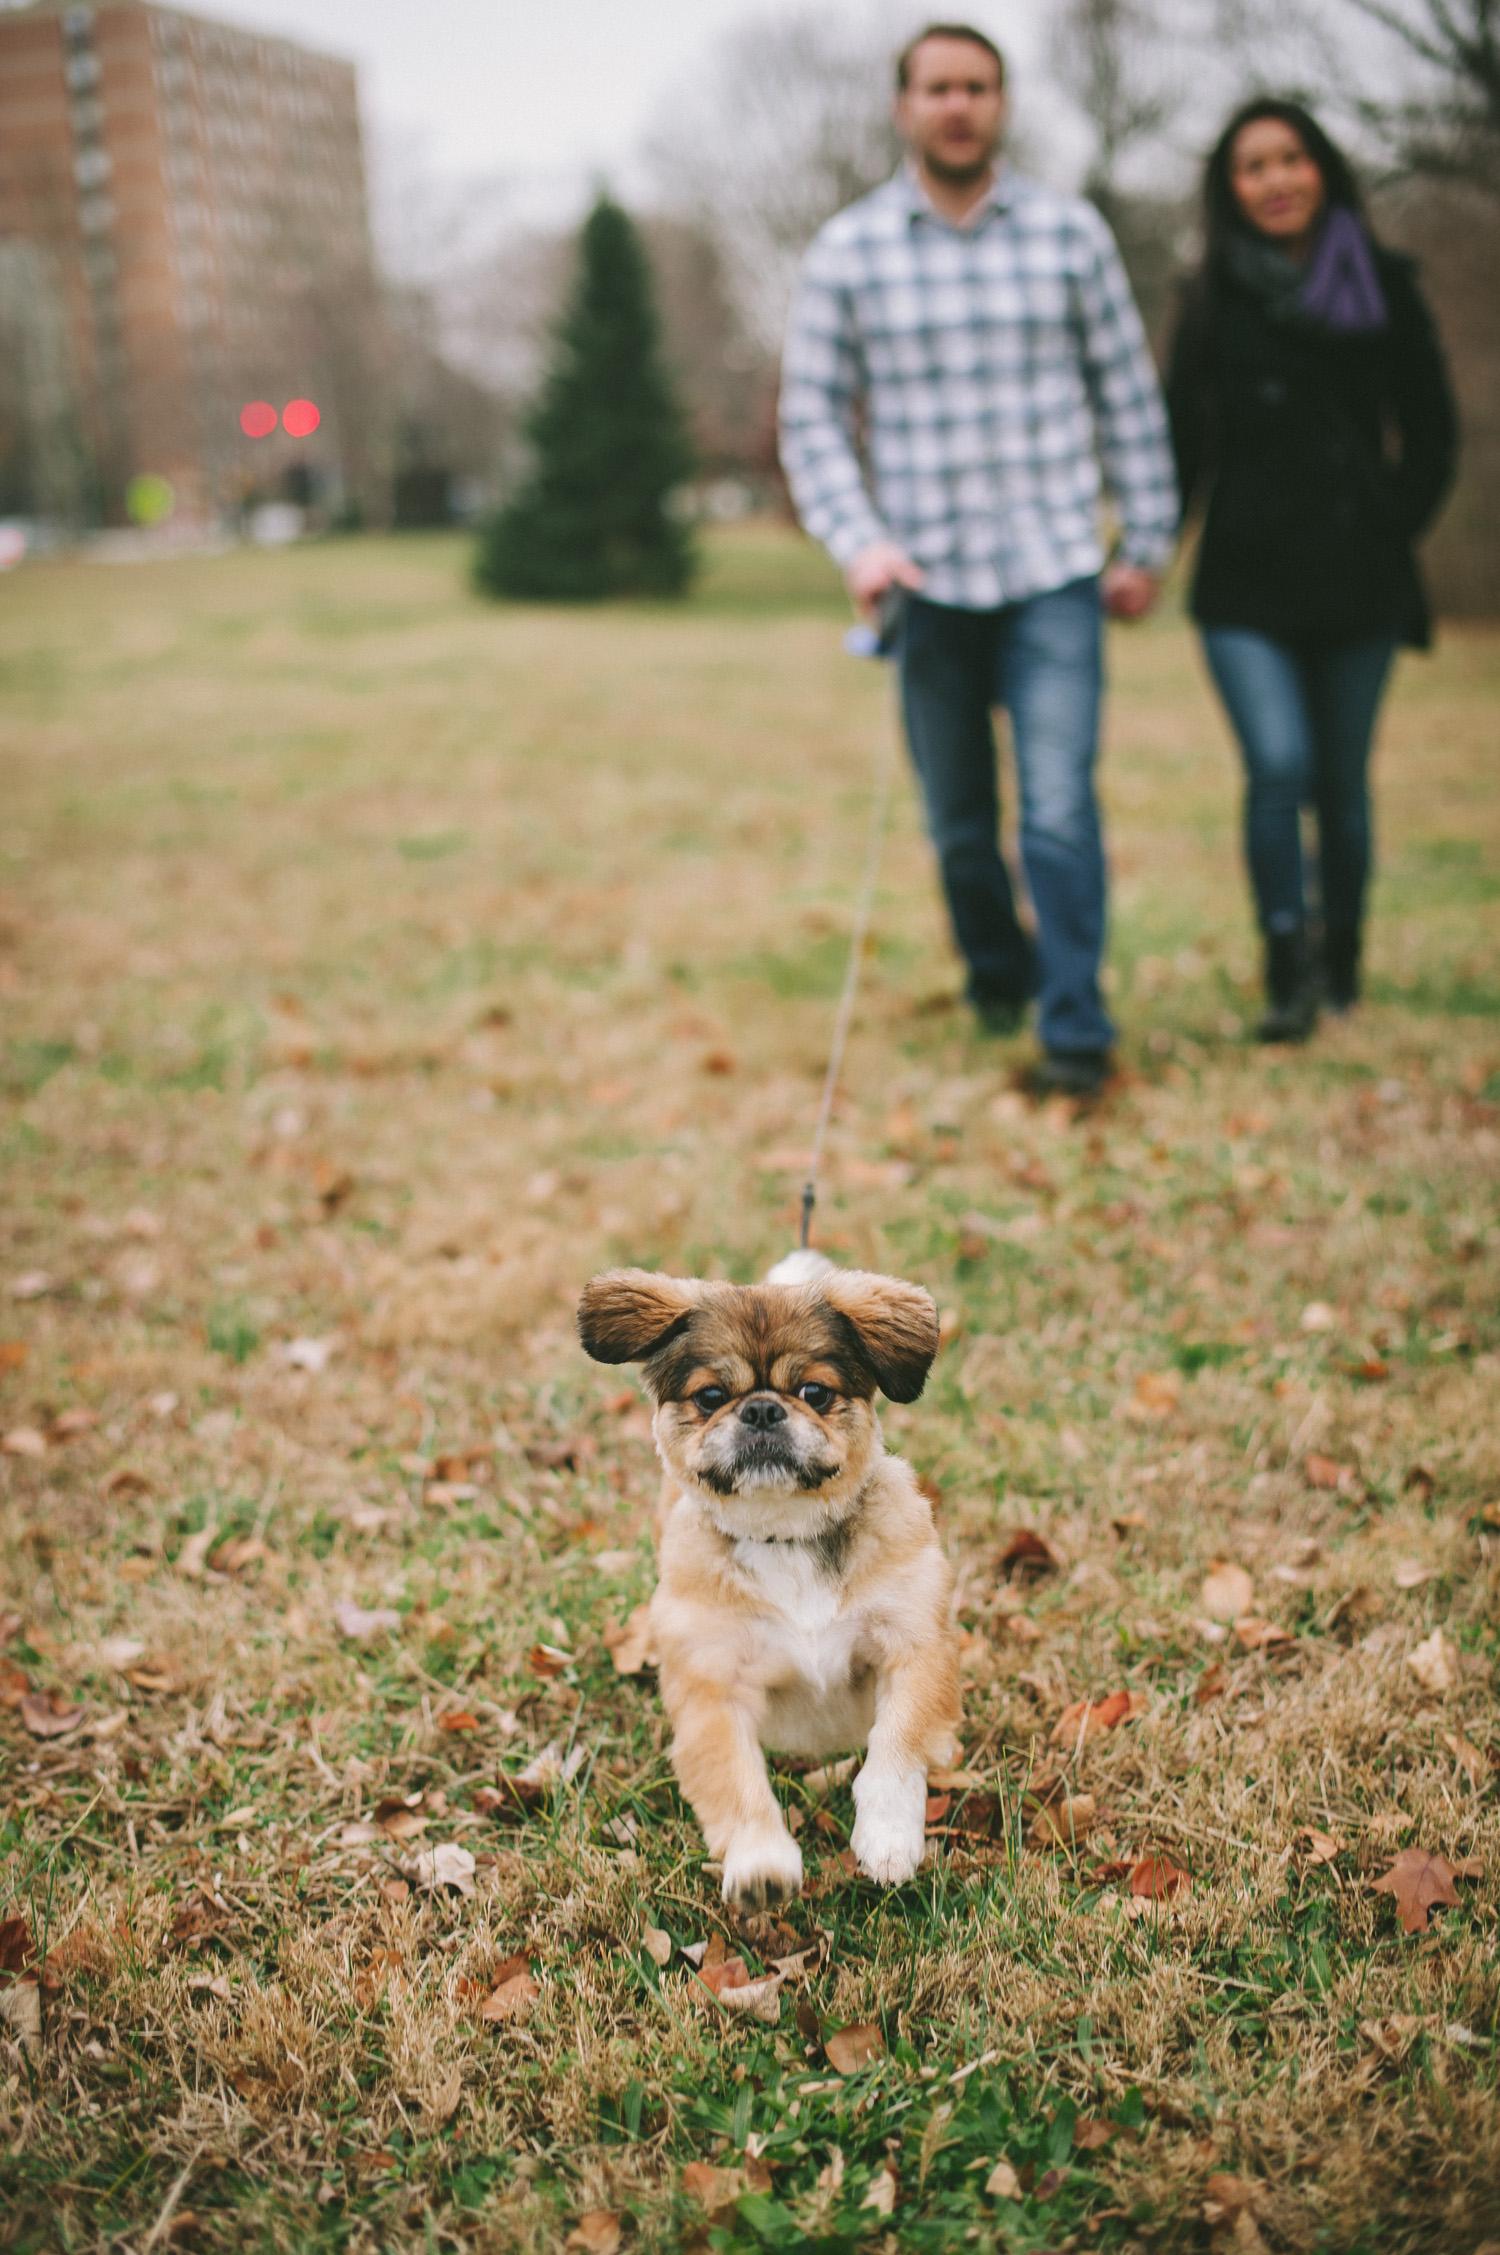 pat-robinson-photography-dog-7.jpg